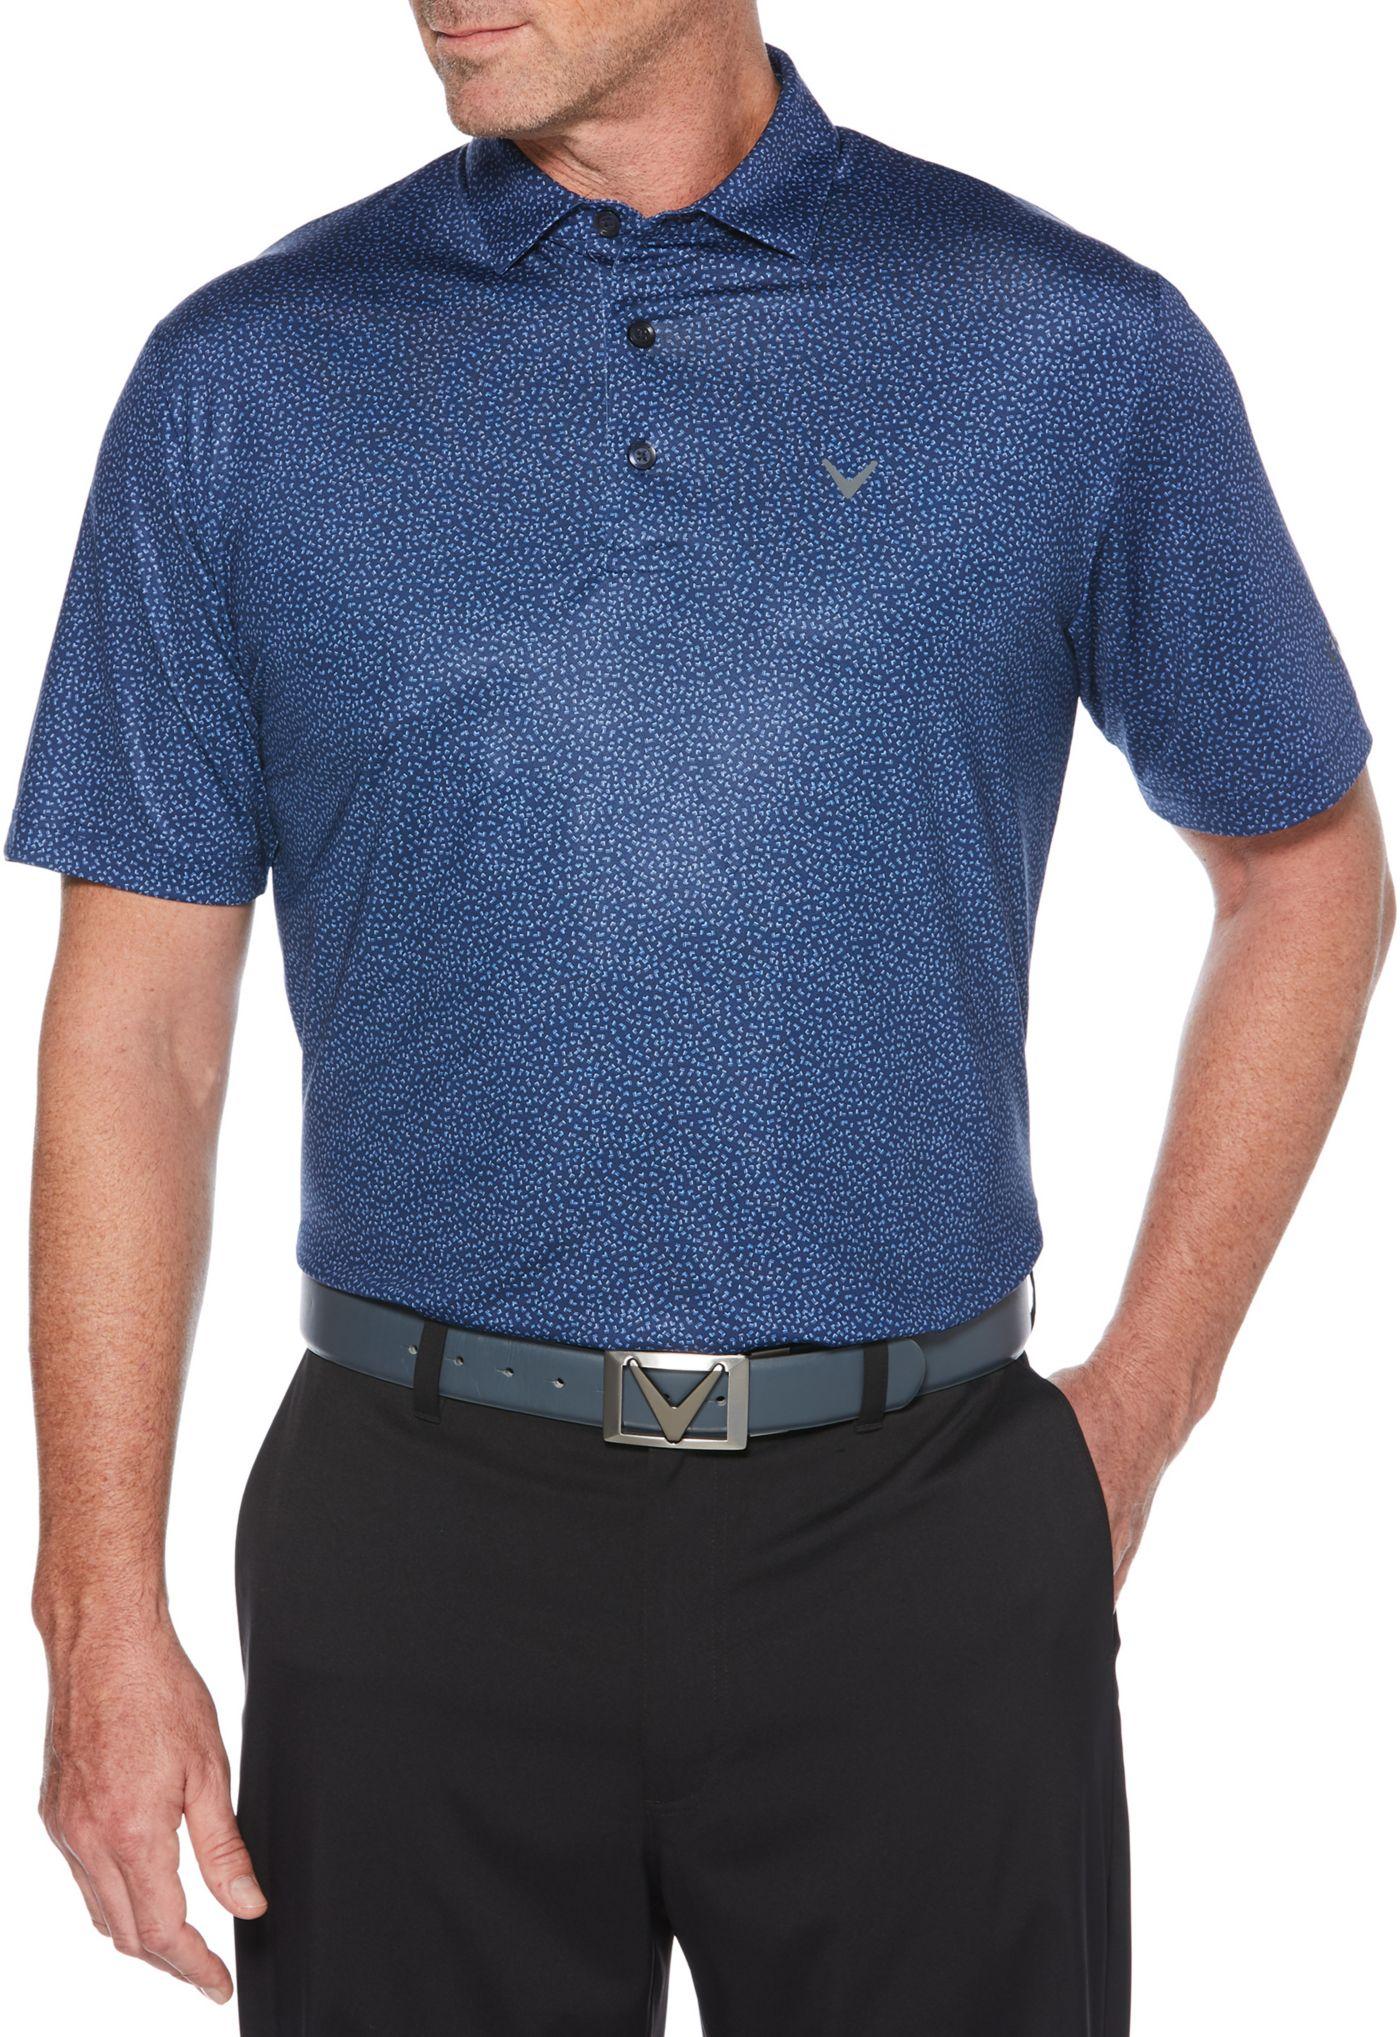 Callaway Men's Mini-Chev Print Golf Polo